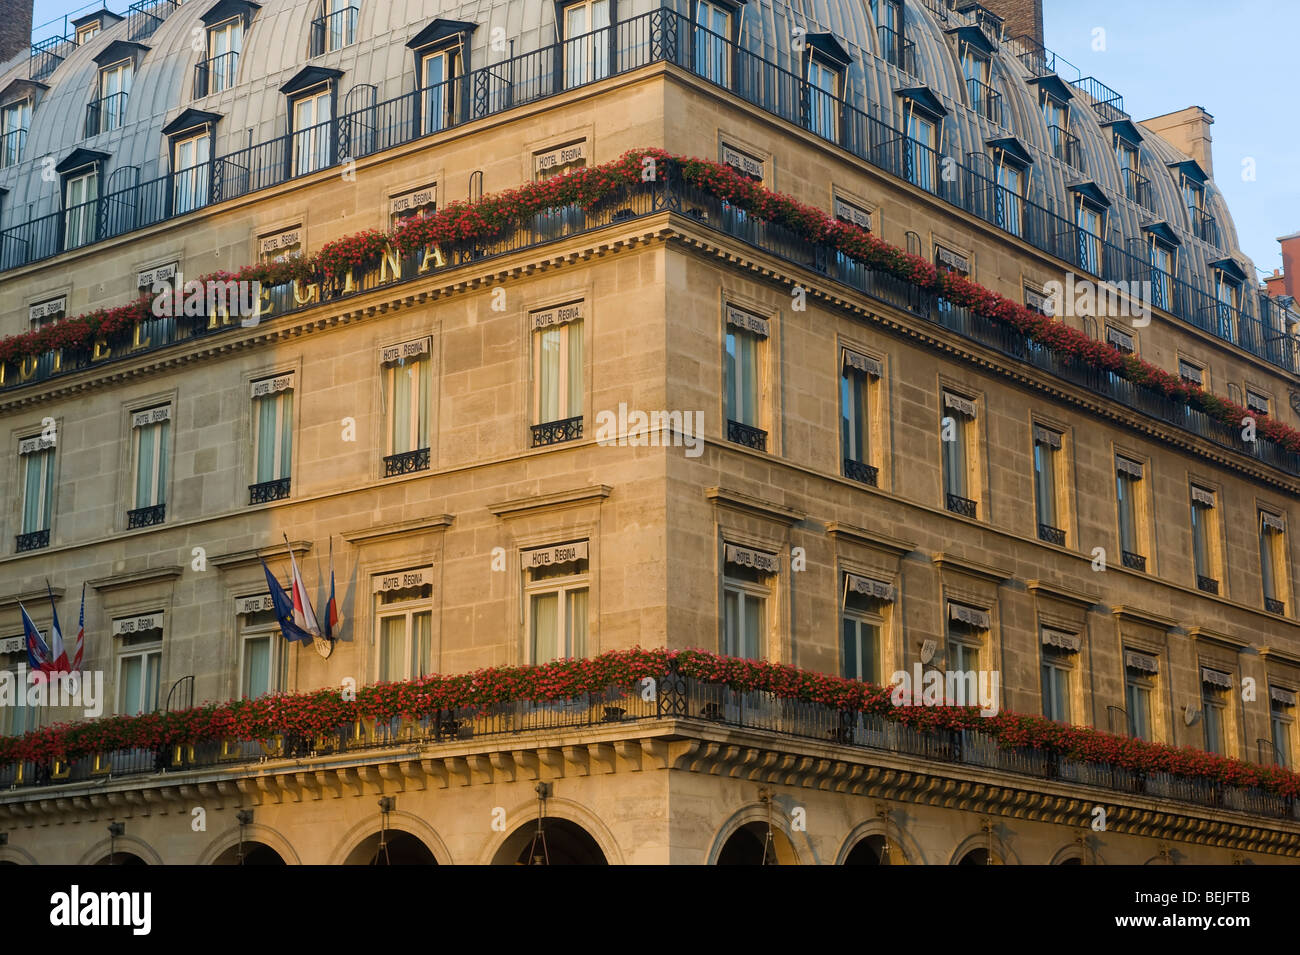 Hotel Facade at Sunset, Paris, France - Stock Image